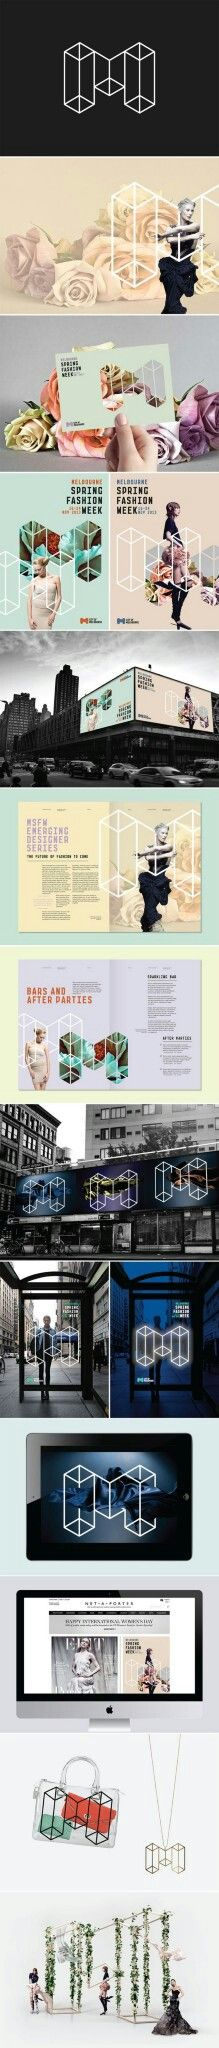 Melbourne Spring Fashion Week Branding | Fivestar Branding – Design and Branding Agency & Inspiration Gallery